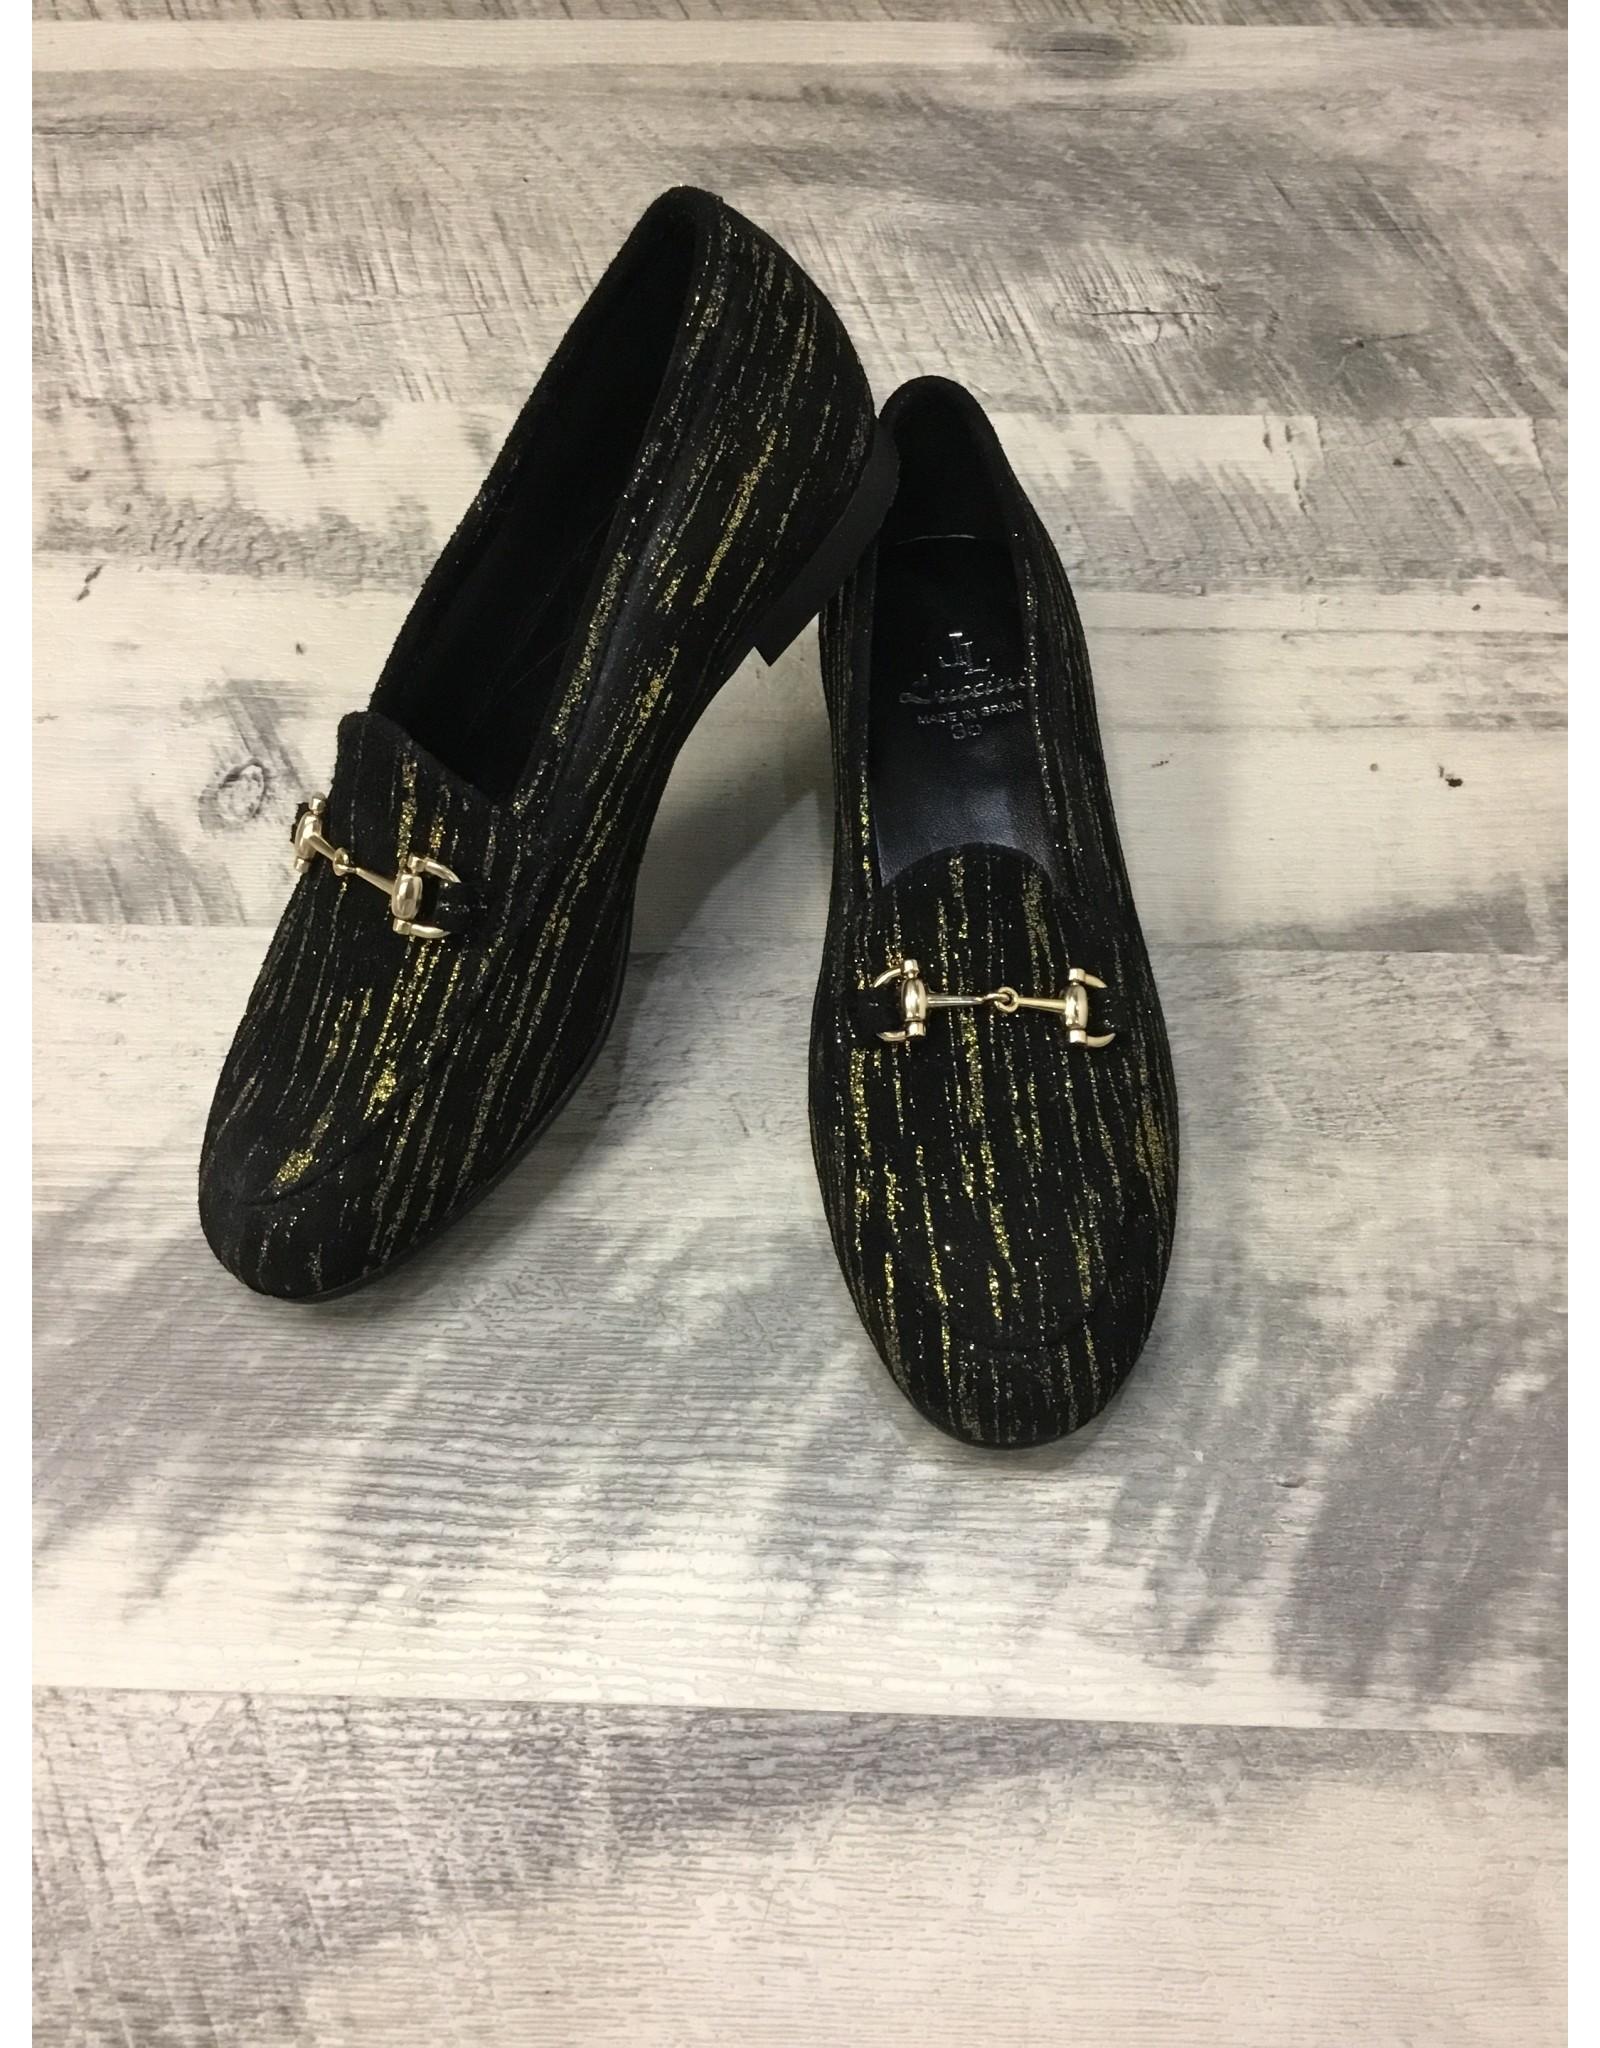 Luccini Luccini Gold GU-1 Loafer